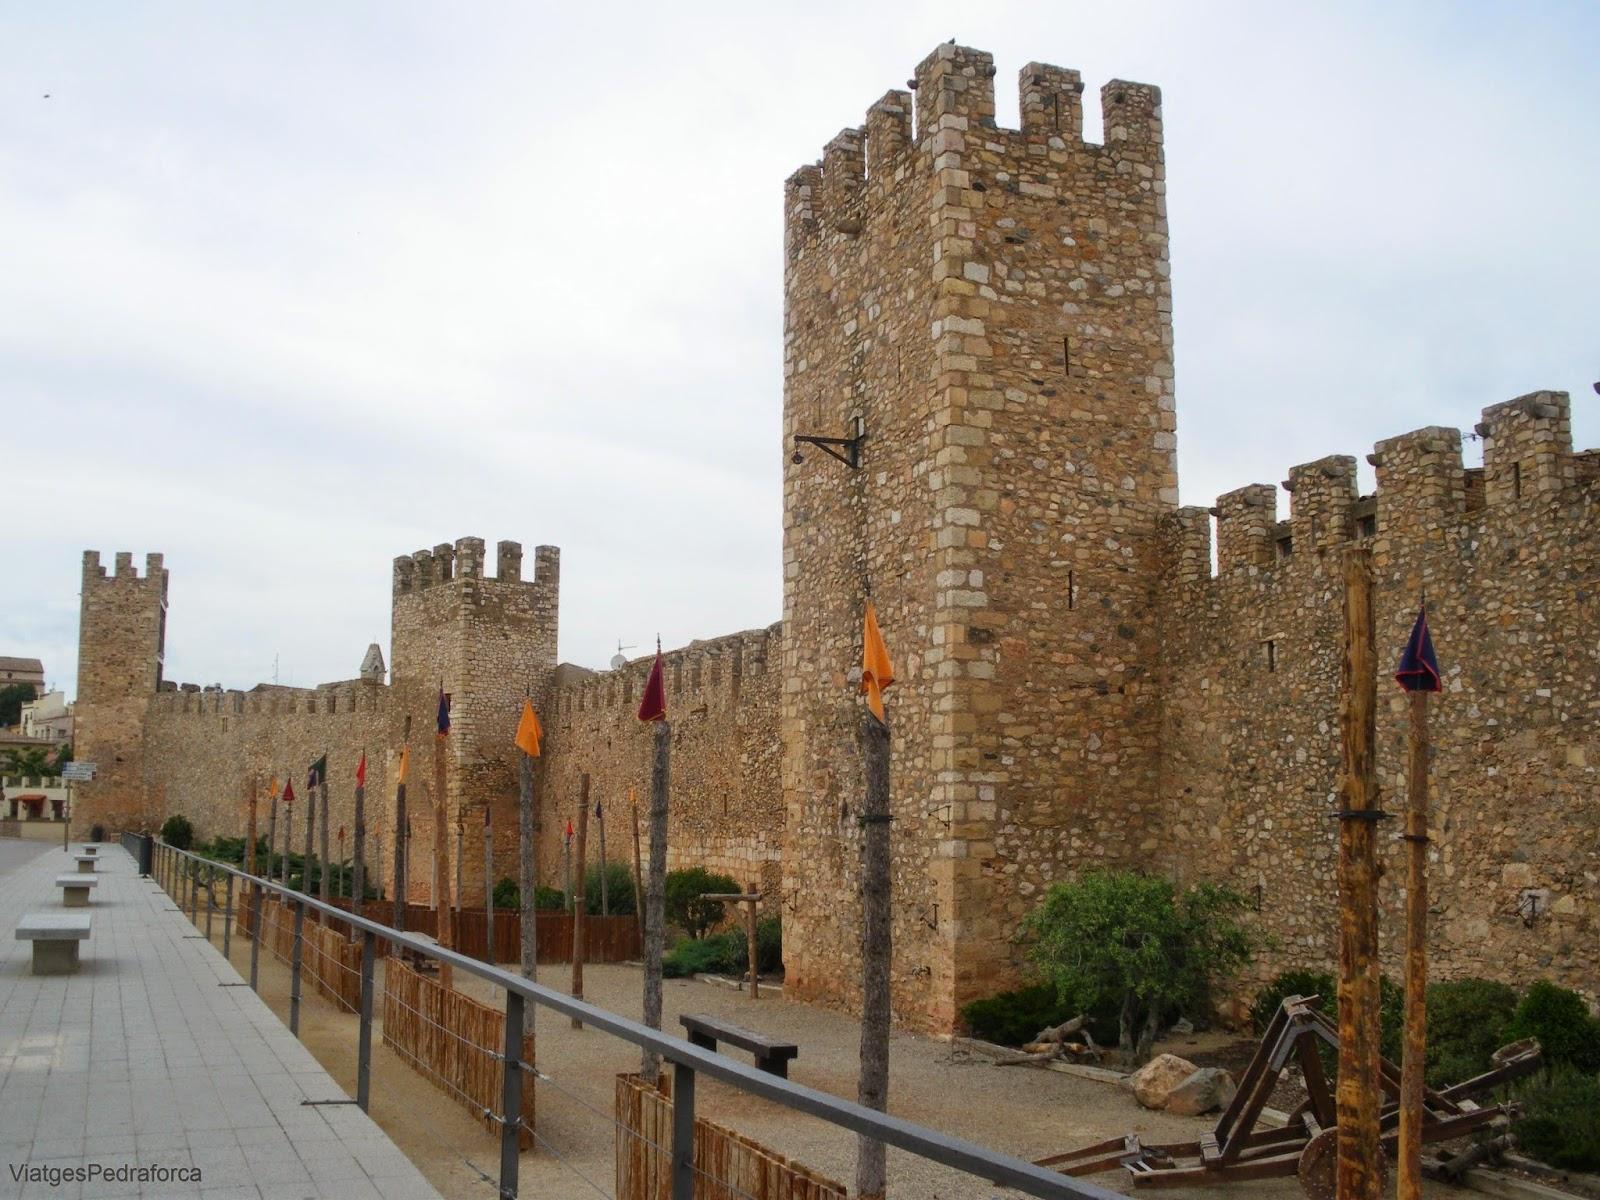 Muralles de Montblanc Conca de Barberà